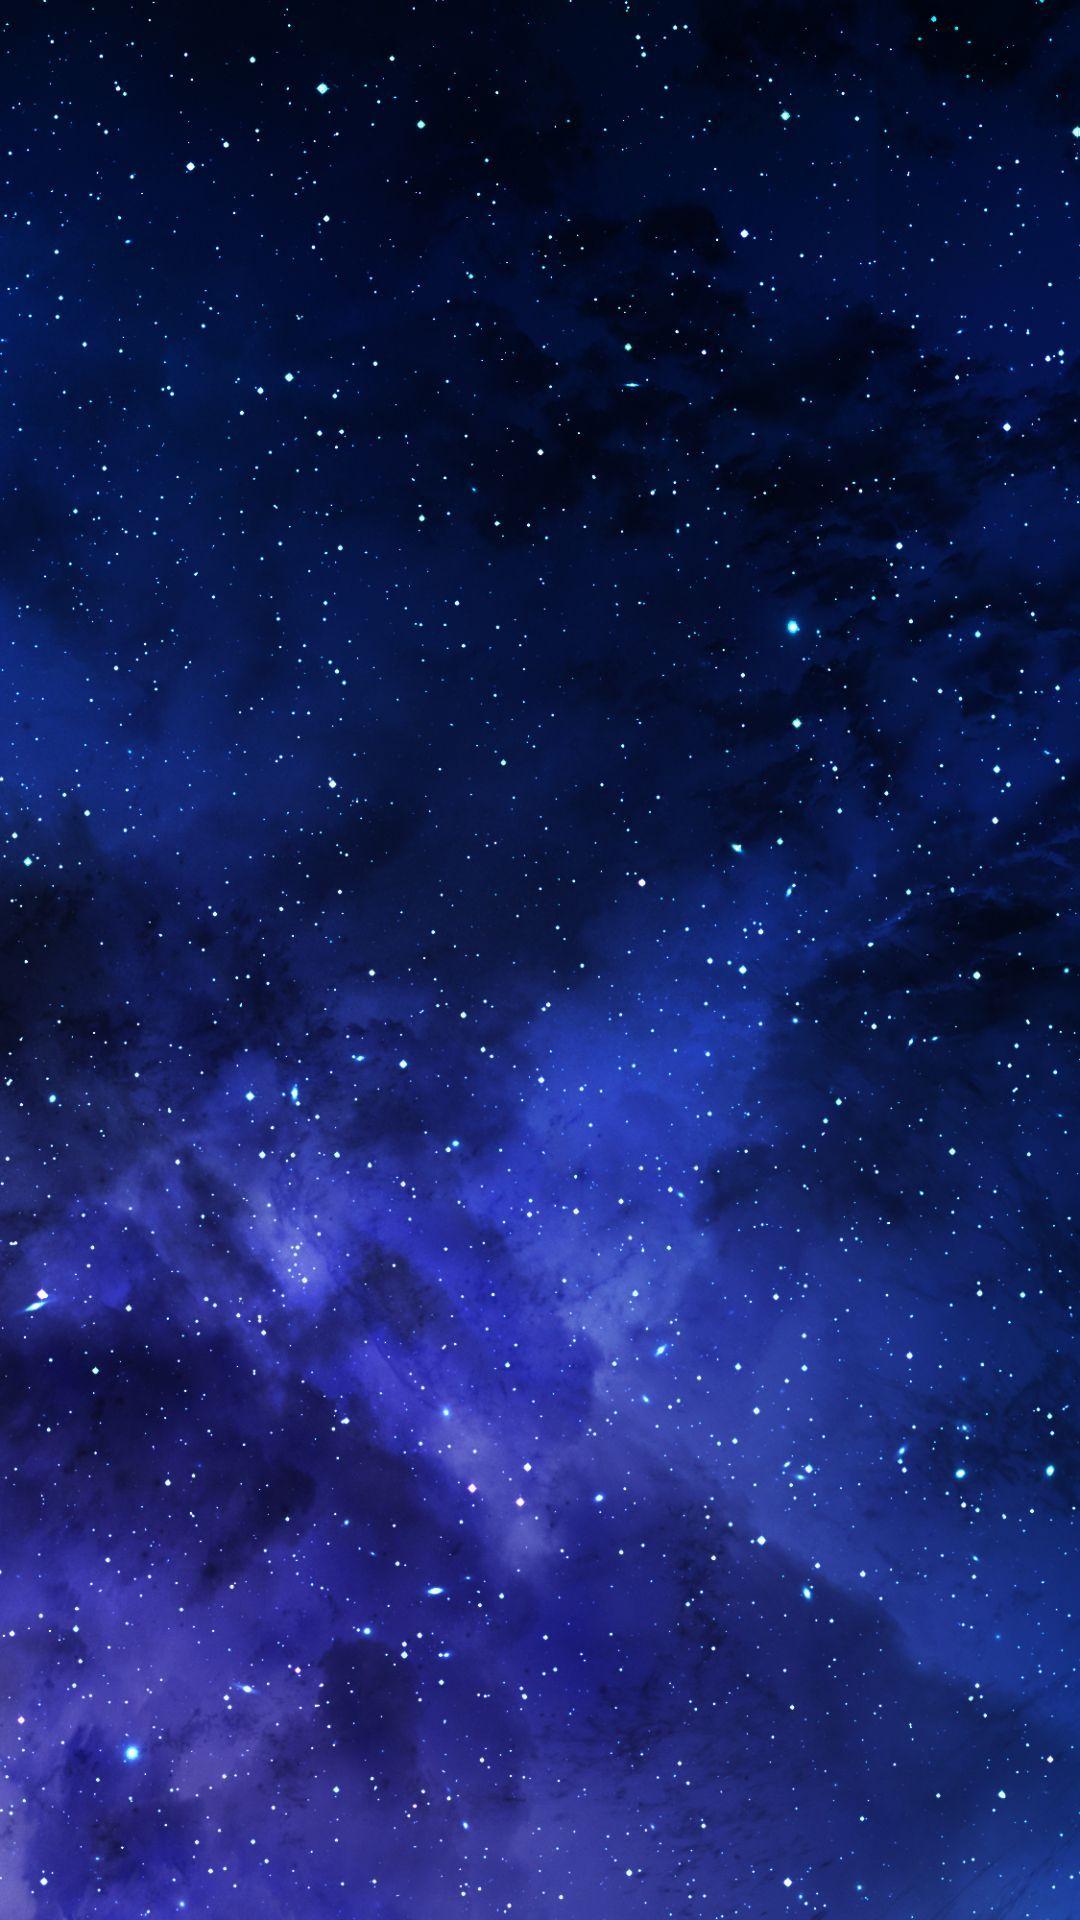 Sci Fi Space 1080x1920 Mobile Wallpaper Blue Galaxy Wallpaper Galaxy Wallpaper Iphone Galaxy Wallpaper